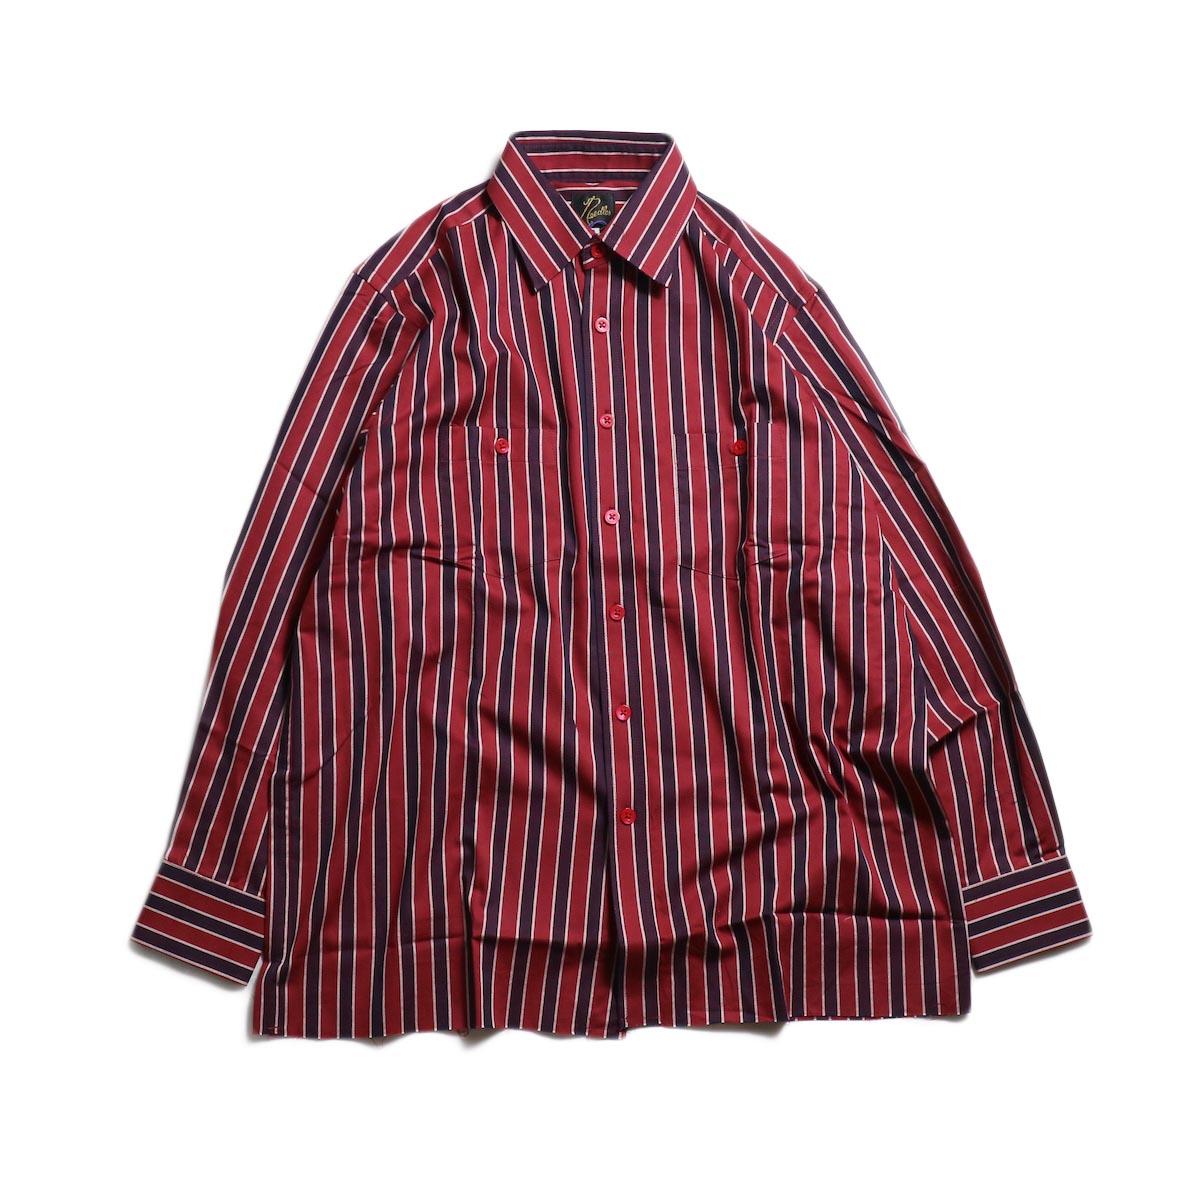 Needles / Cut-Off Bottom Regular Collar Shirt -Cotton Twill Stripe (Red)